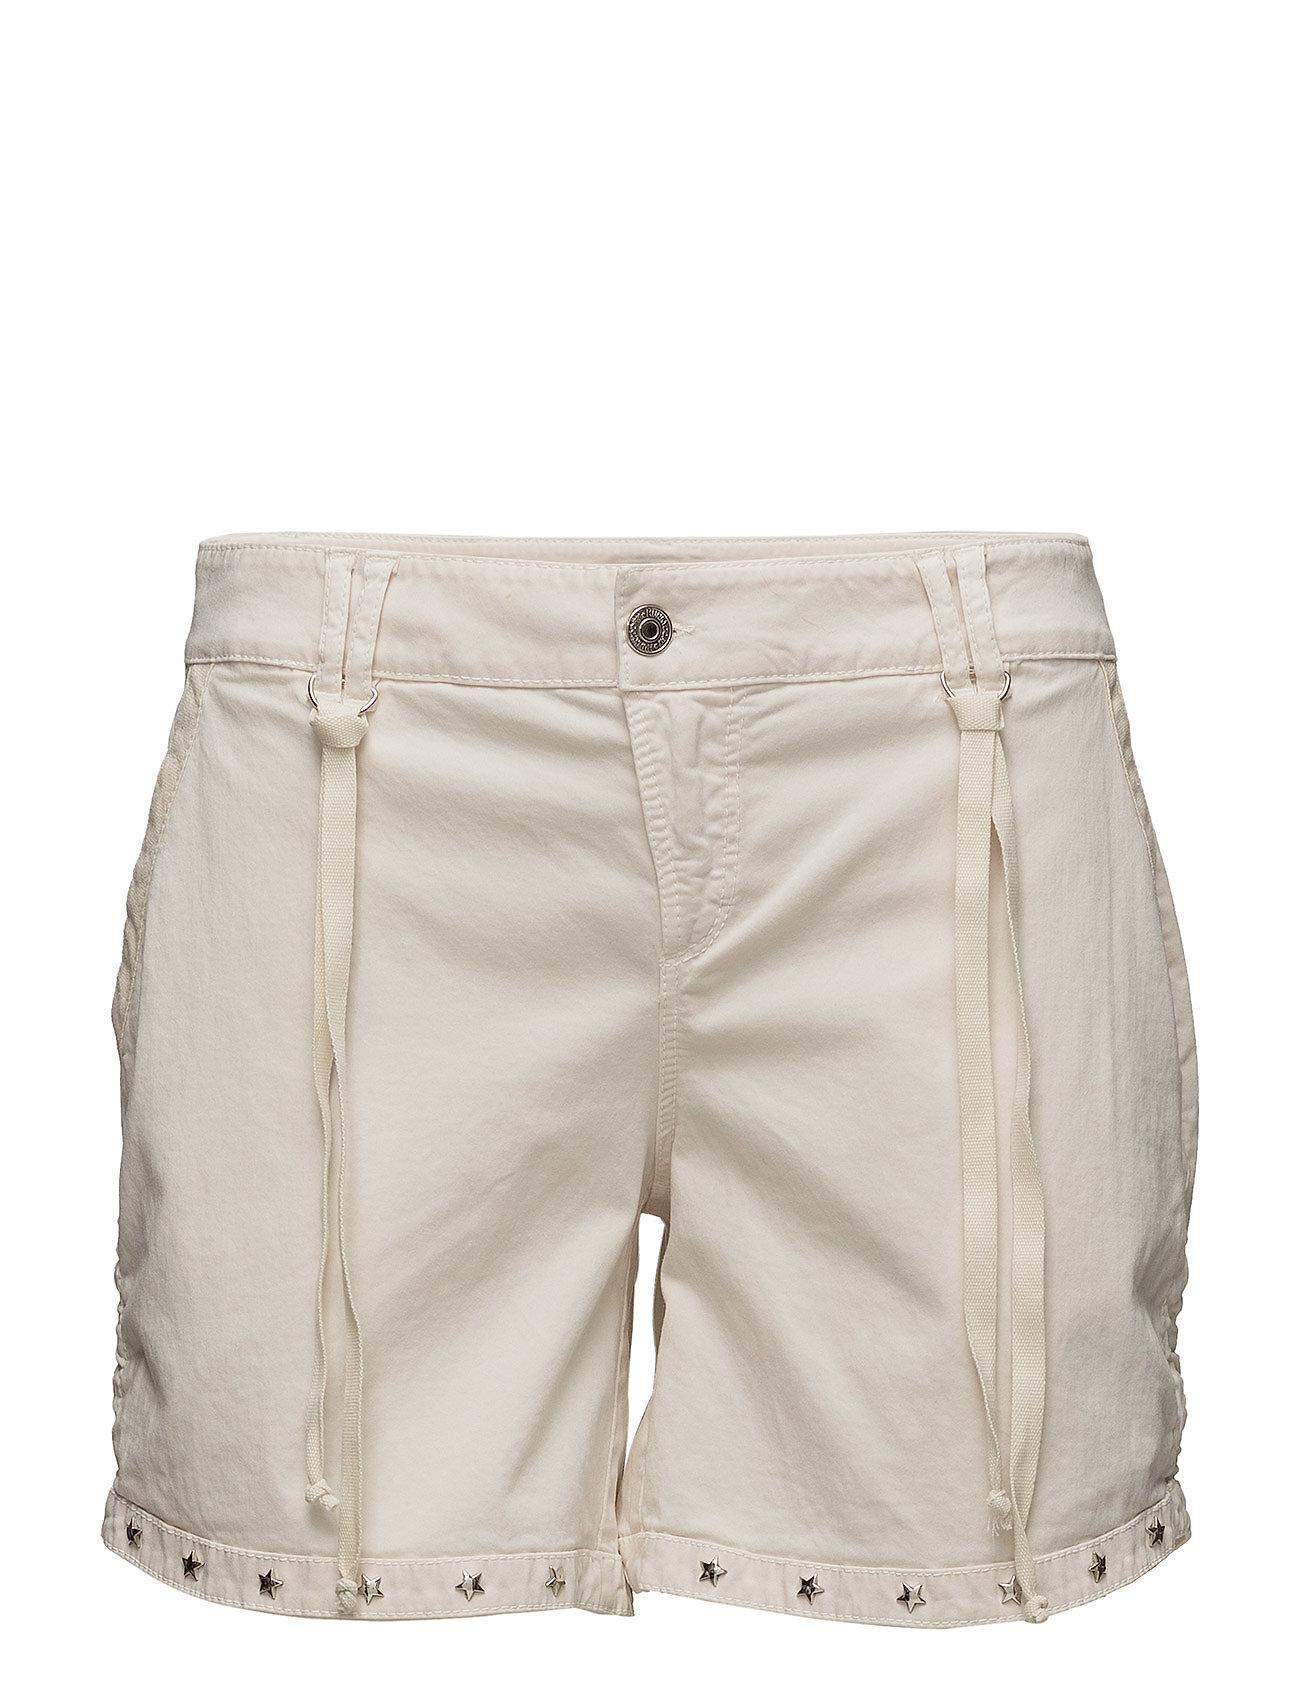 Hunkydory Connor Twill Short Shorts